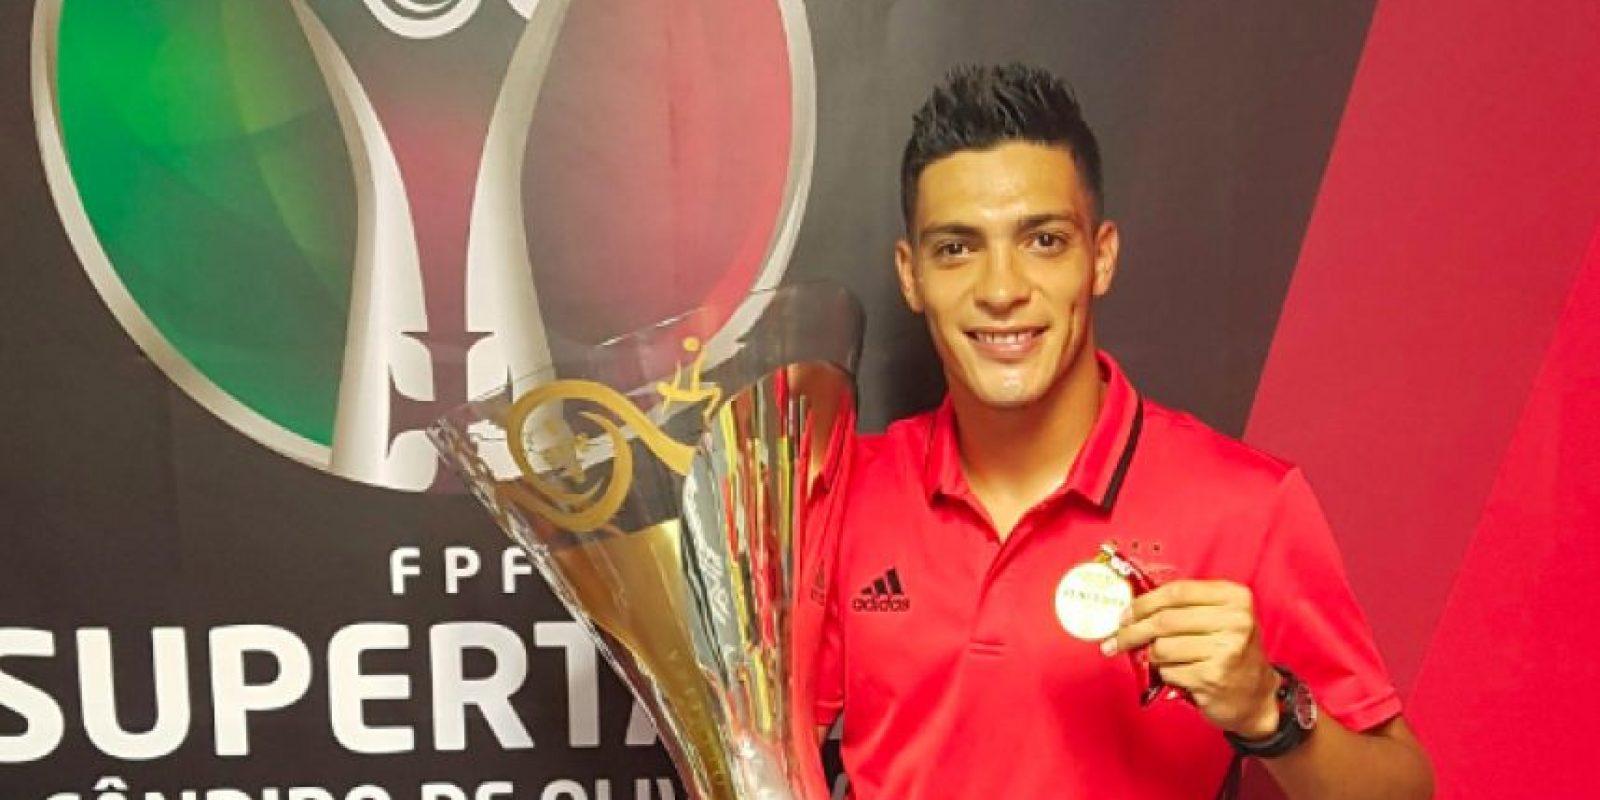 Raúl Jiménez con la Supercopa de Portugal Foto:Twitter @Raul_jimenez9